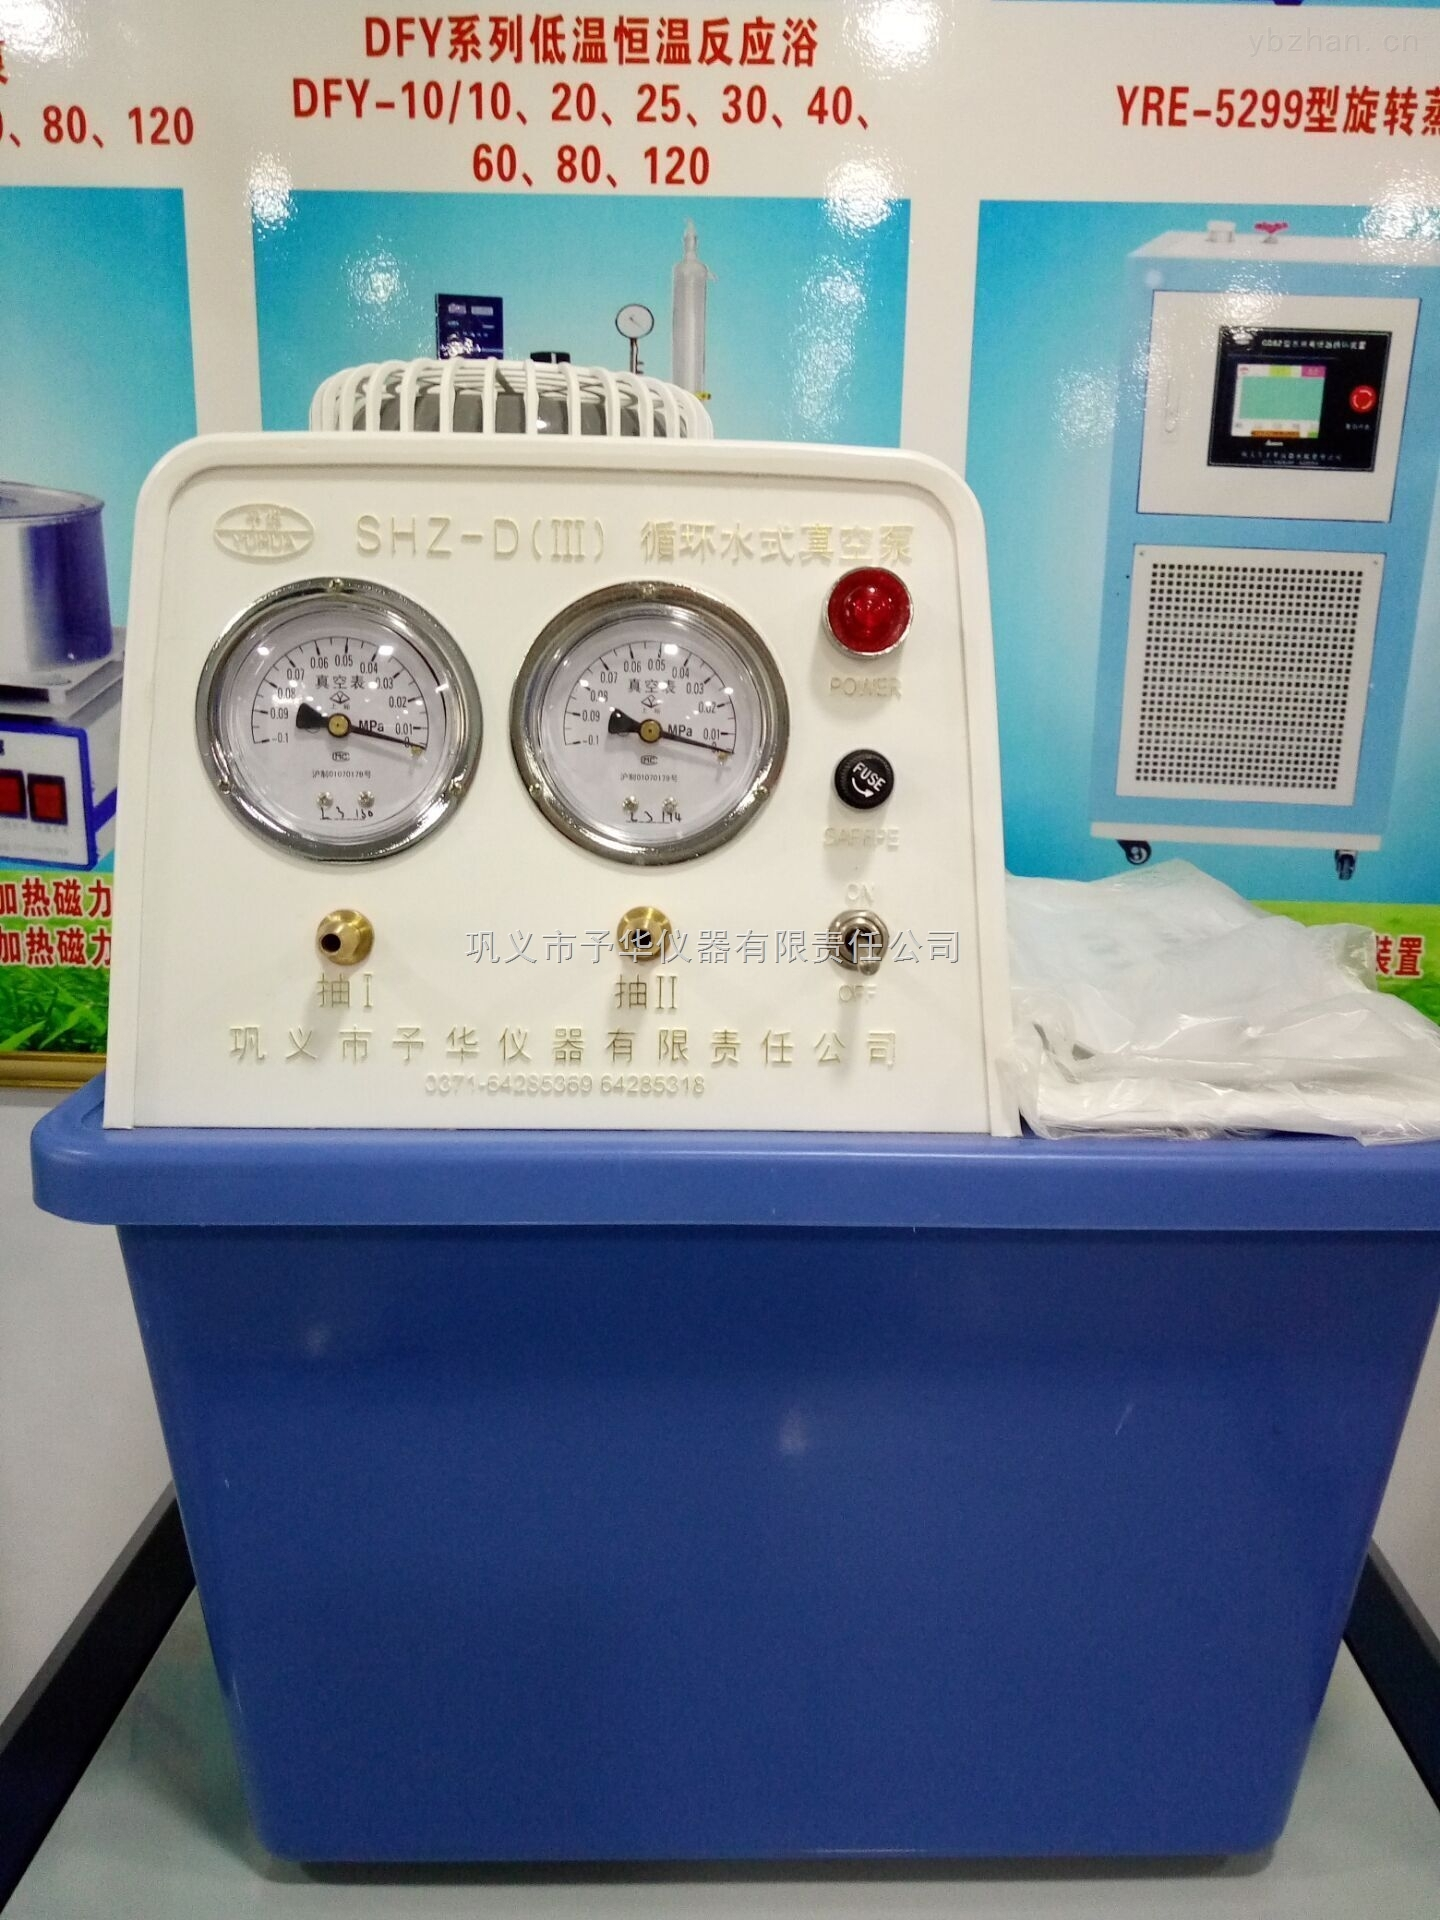 SHZ-D(Ⅲ)-台式循环水多用真空泵予华仪器热销产品